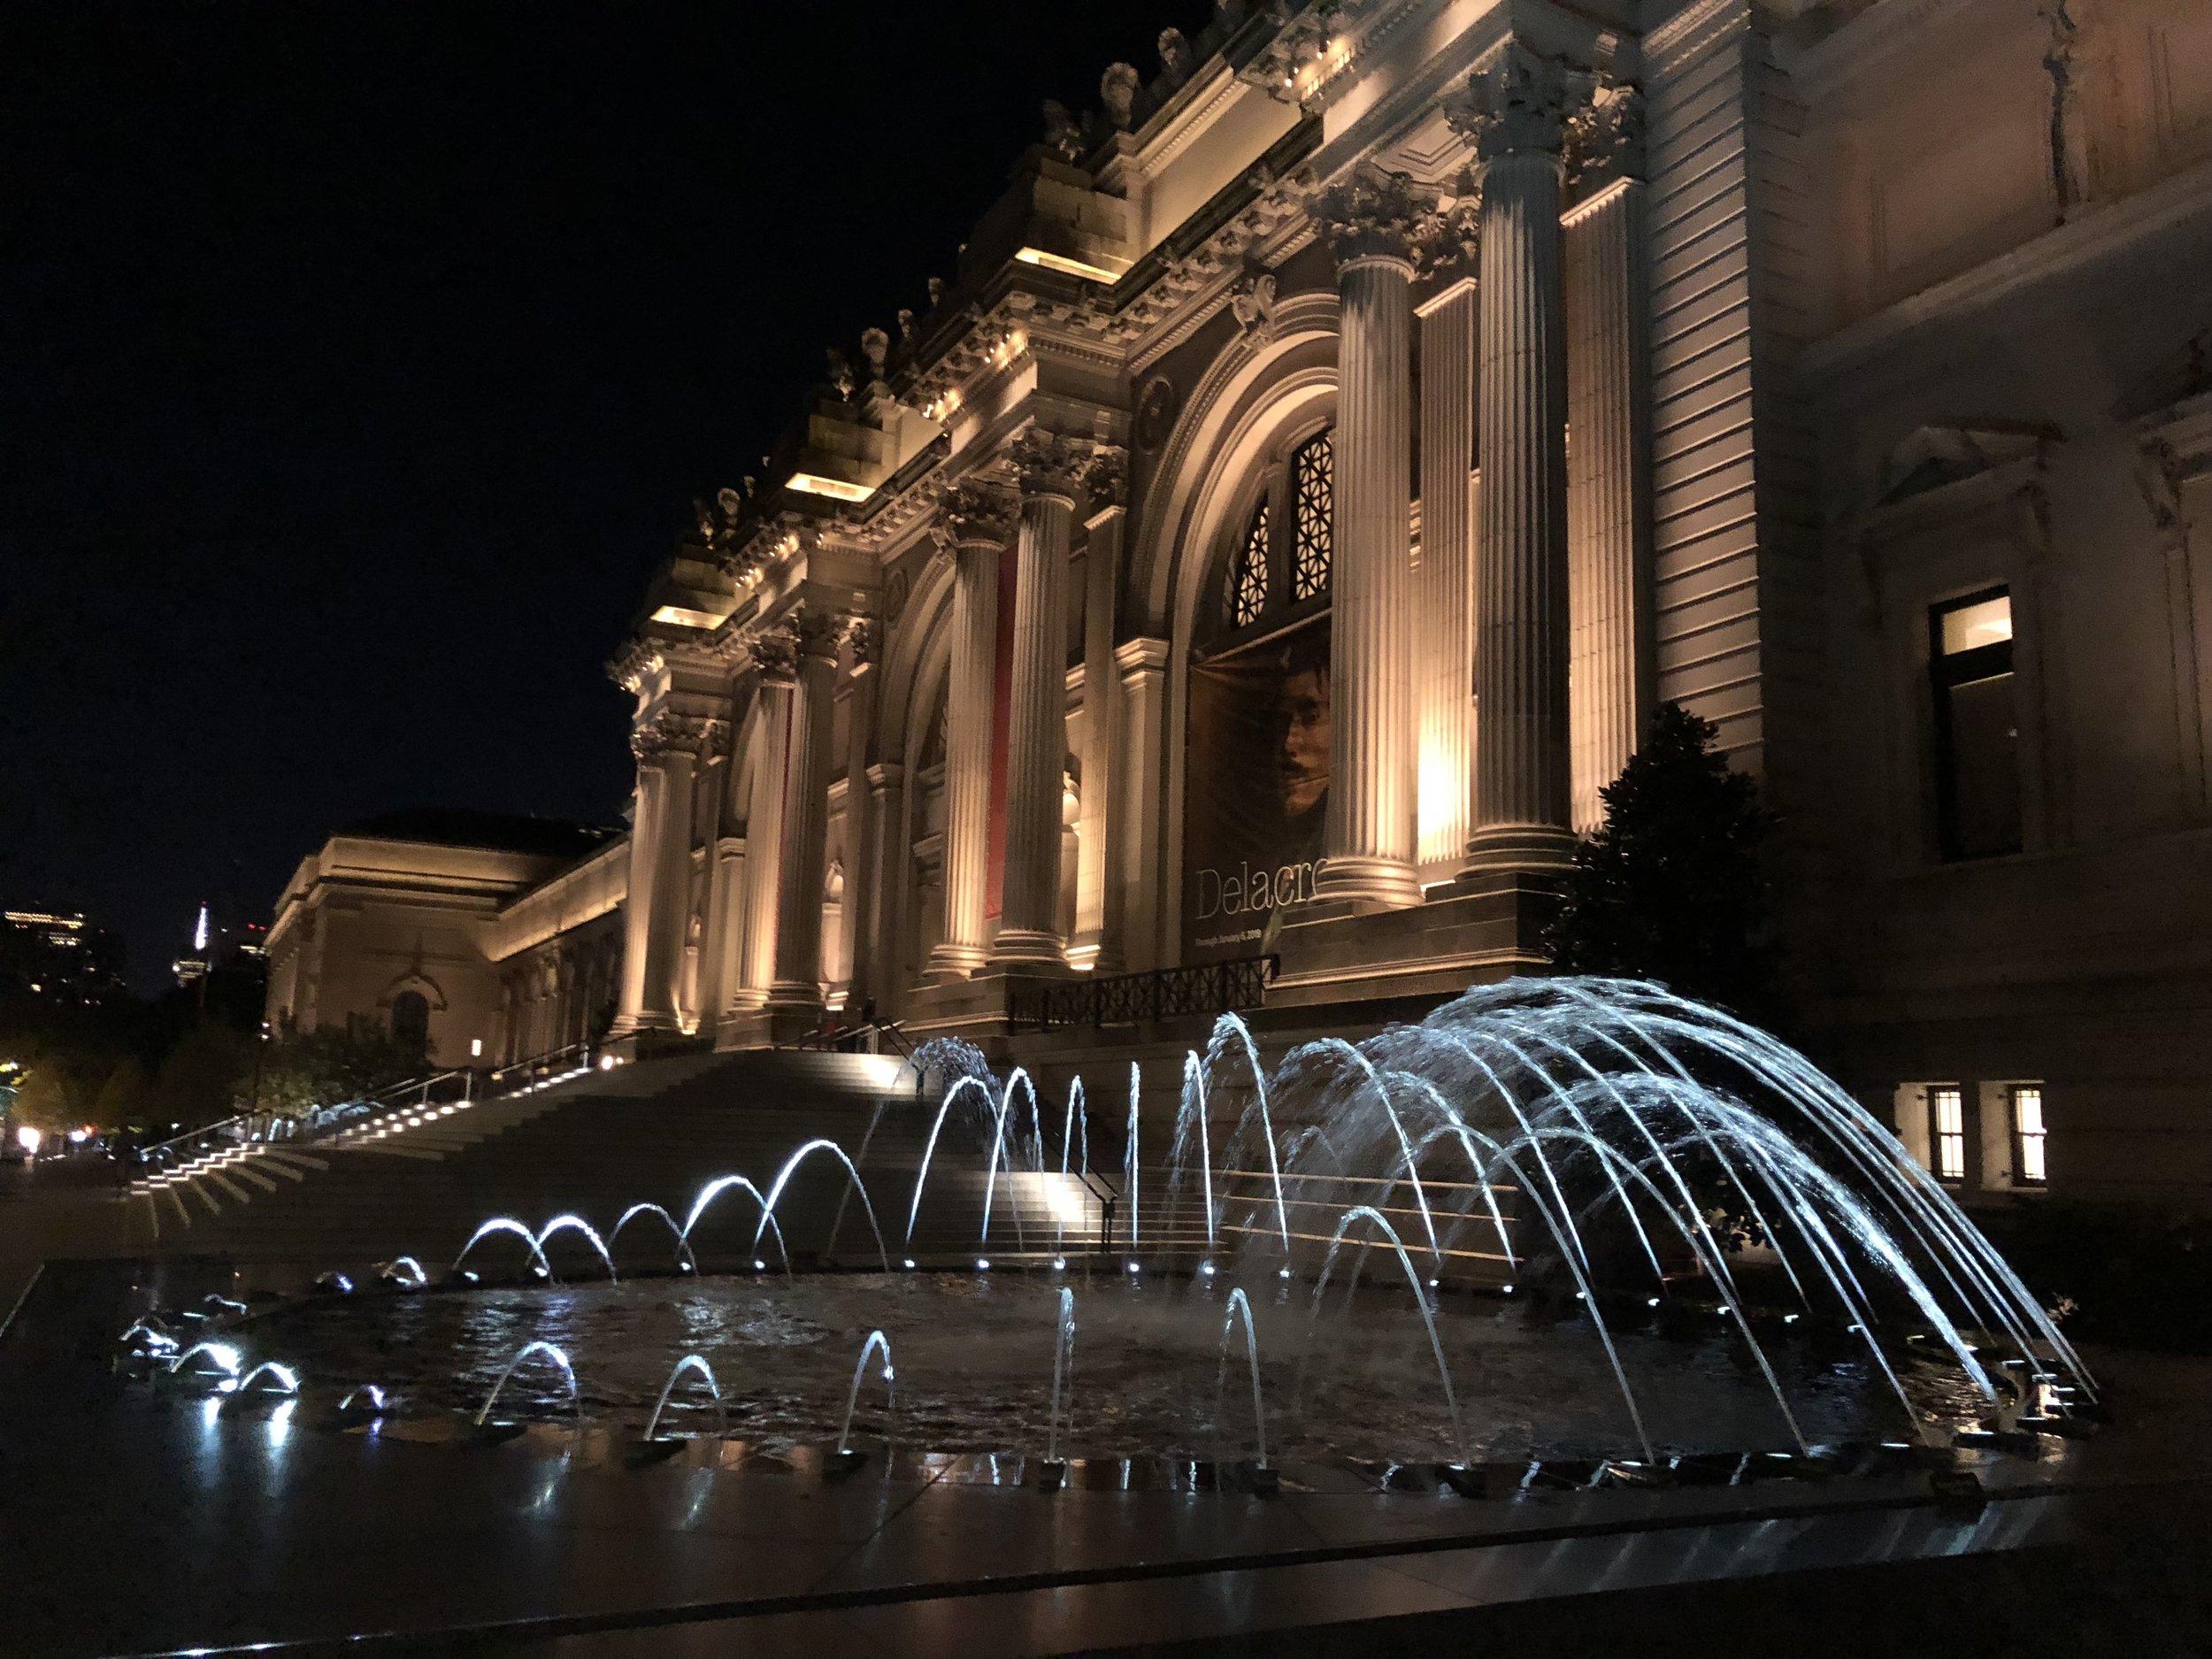 The Met at night